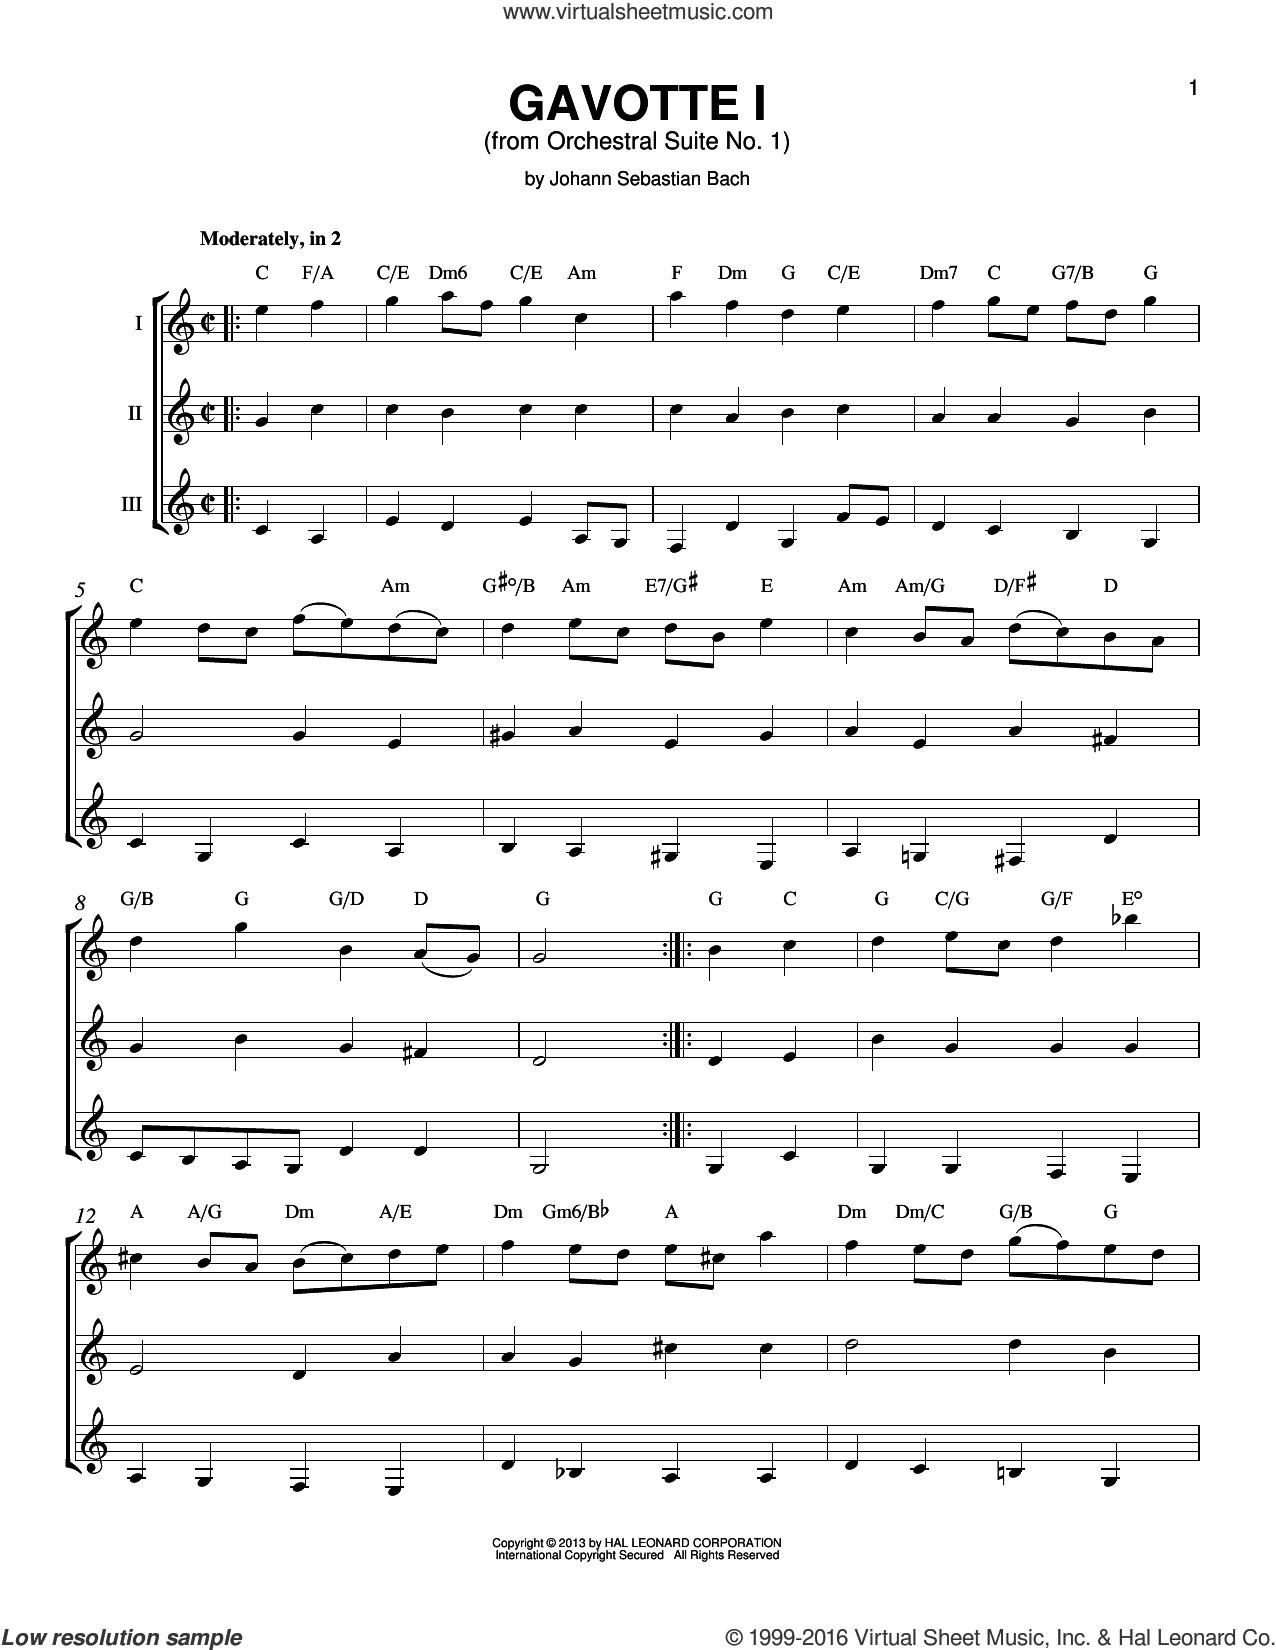 Gavotte 1 sheet music for guitar ensemble by Johann Sebastian Bach, classical score, intermediate skill level